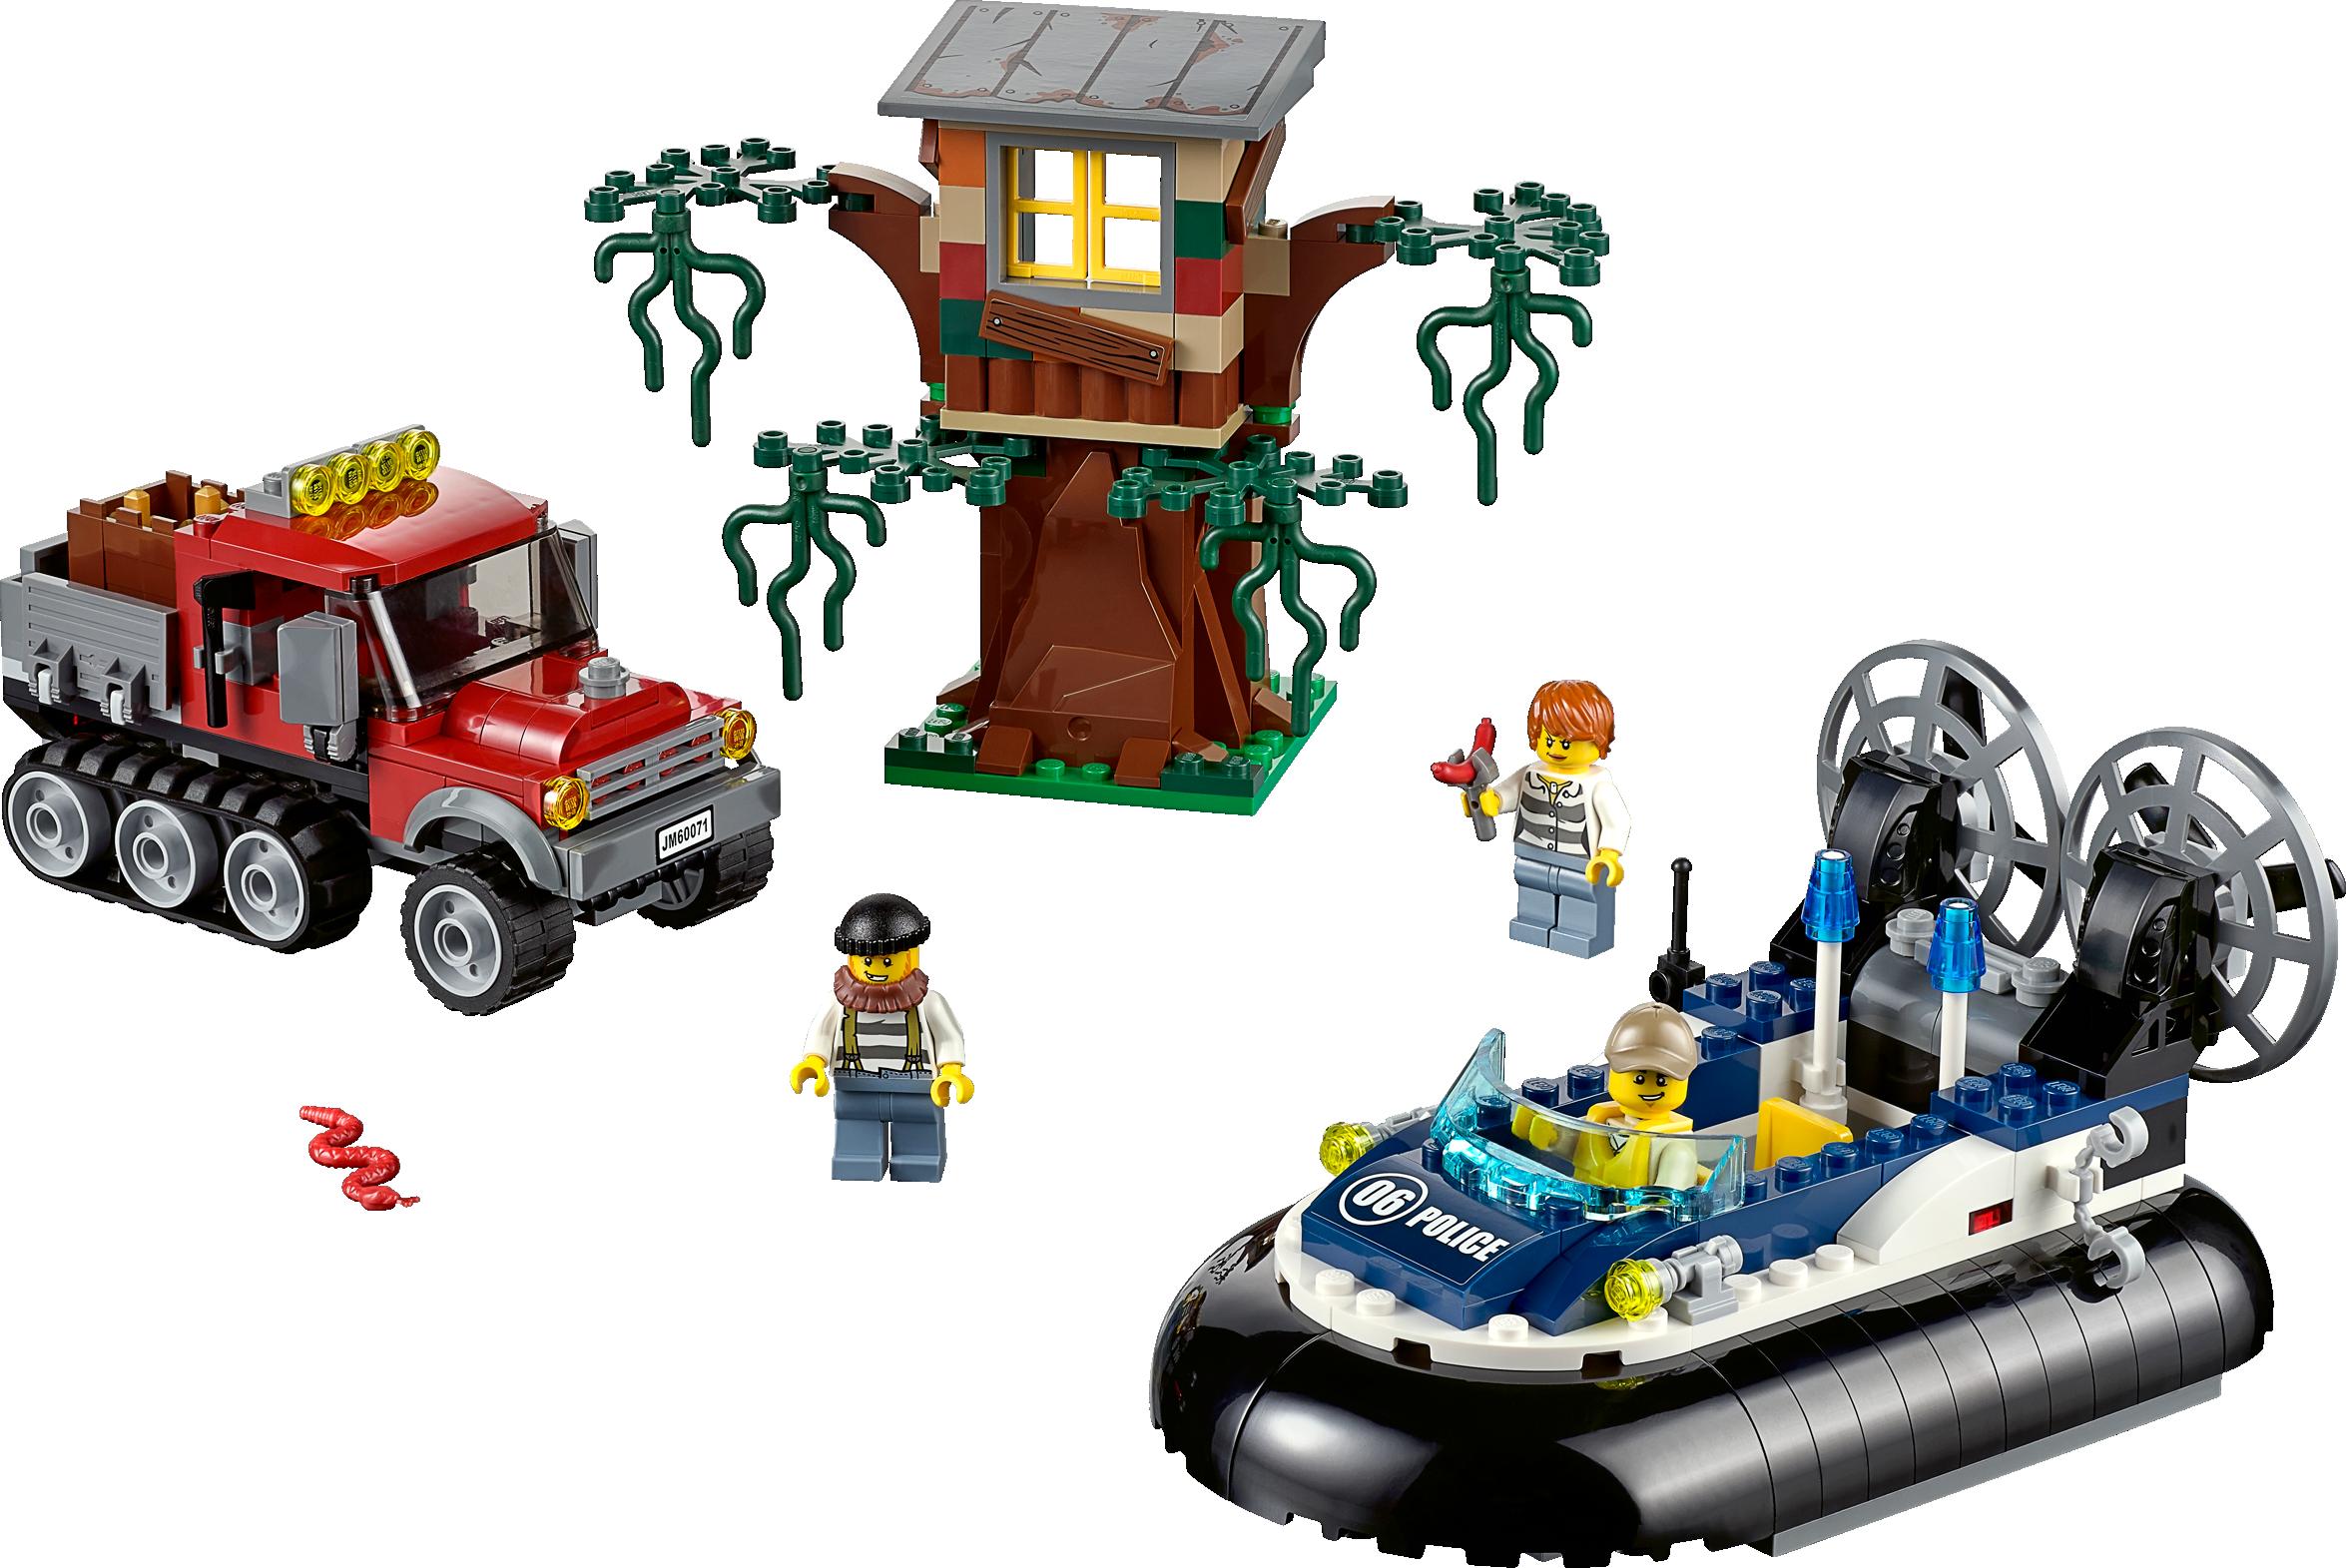 Hovercraft Arrest